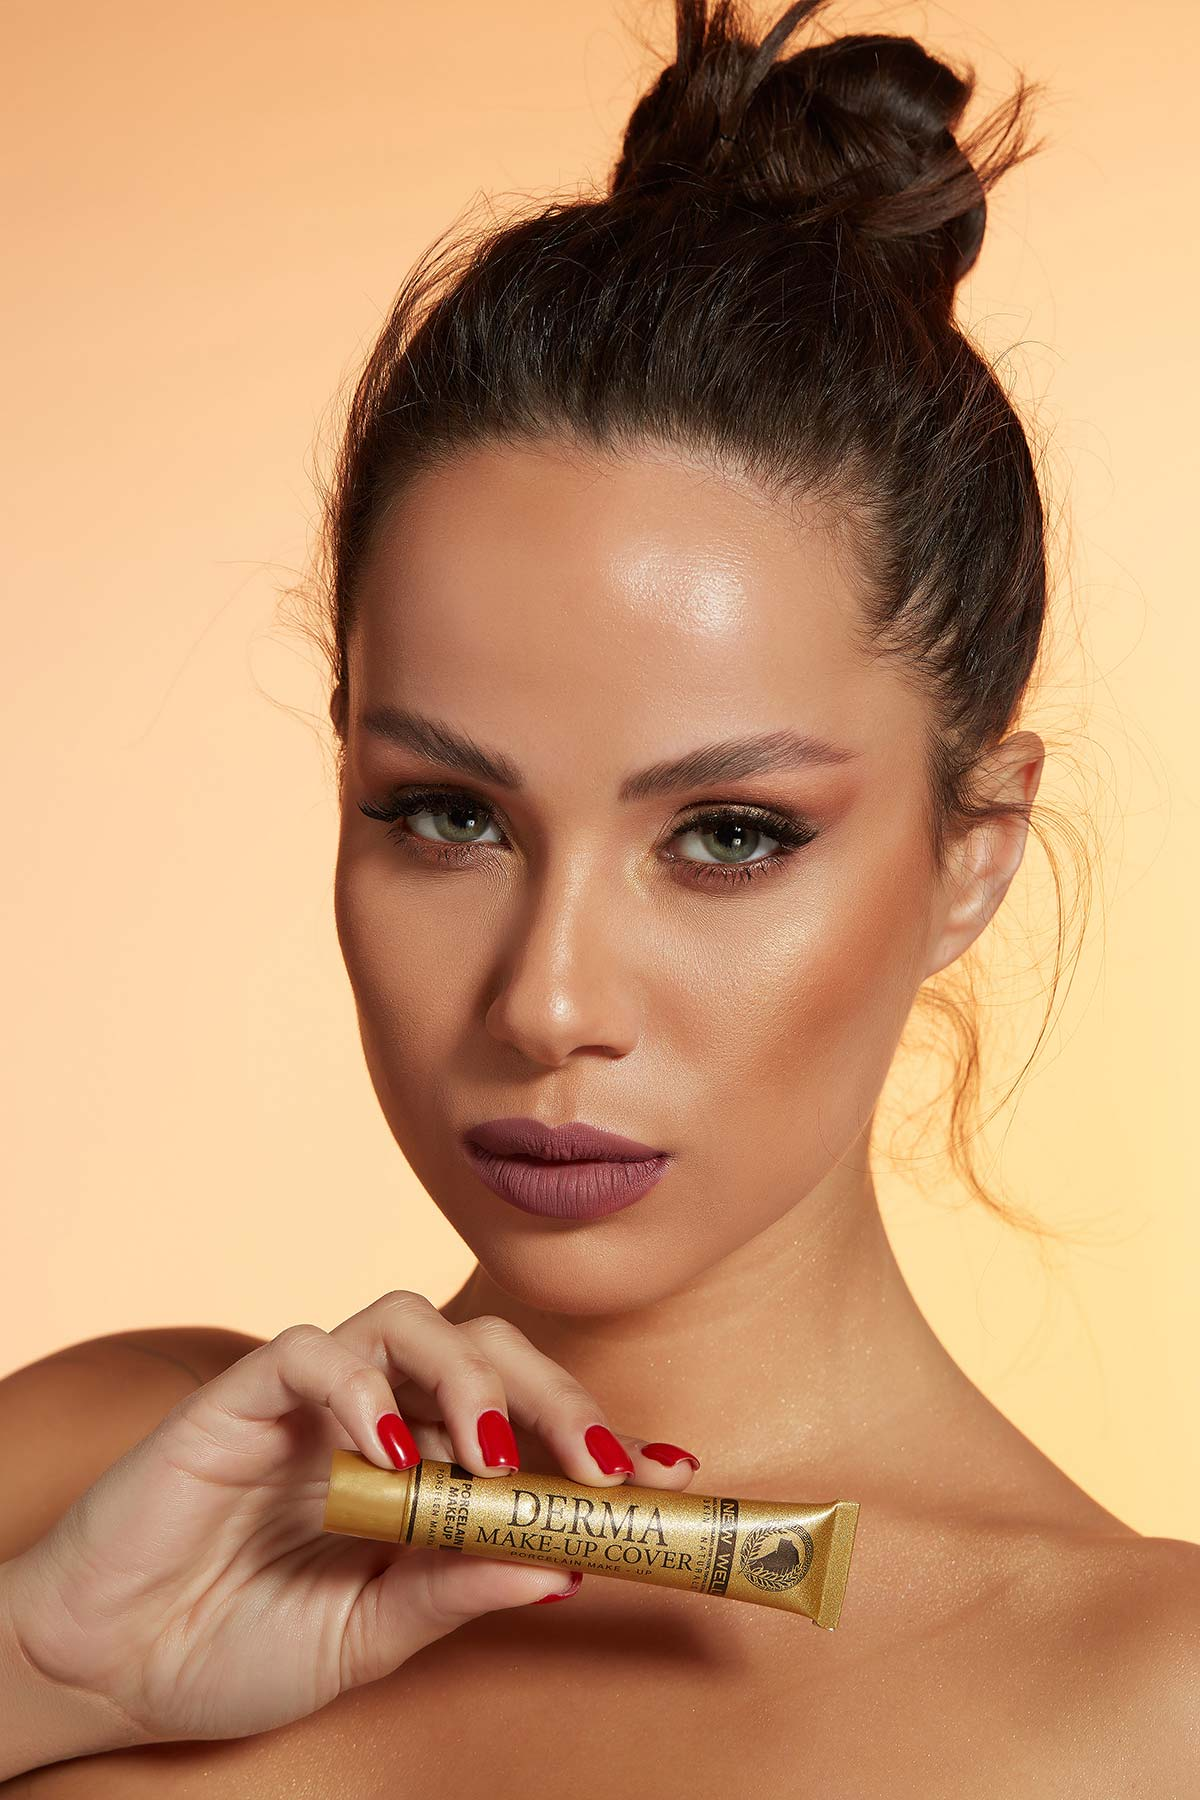 Derma Make-Up Cover Foundation - Gold -Fondöten - Foundation